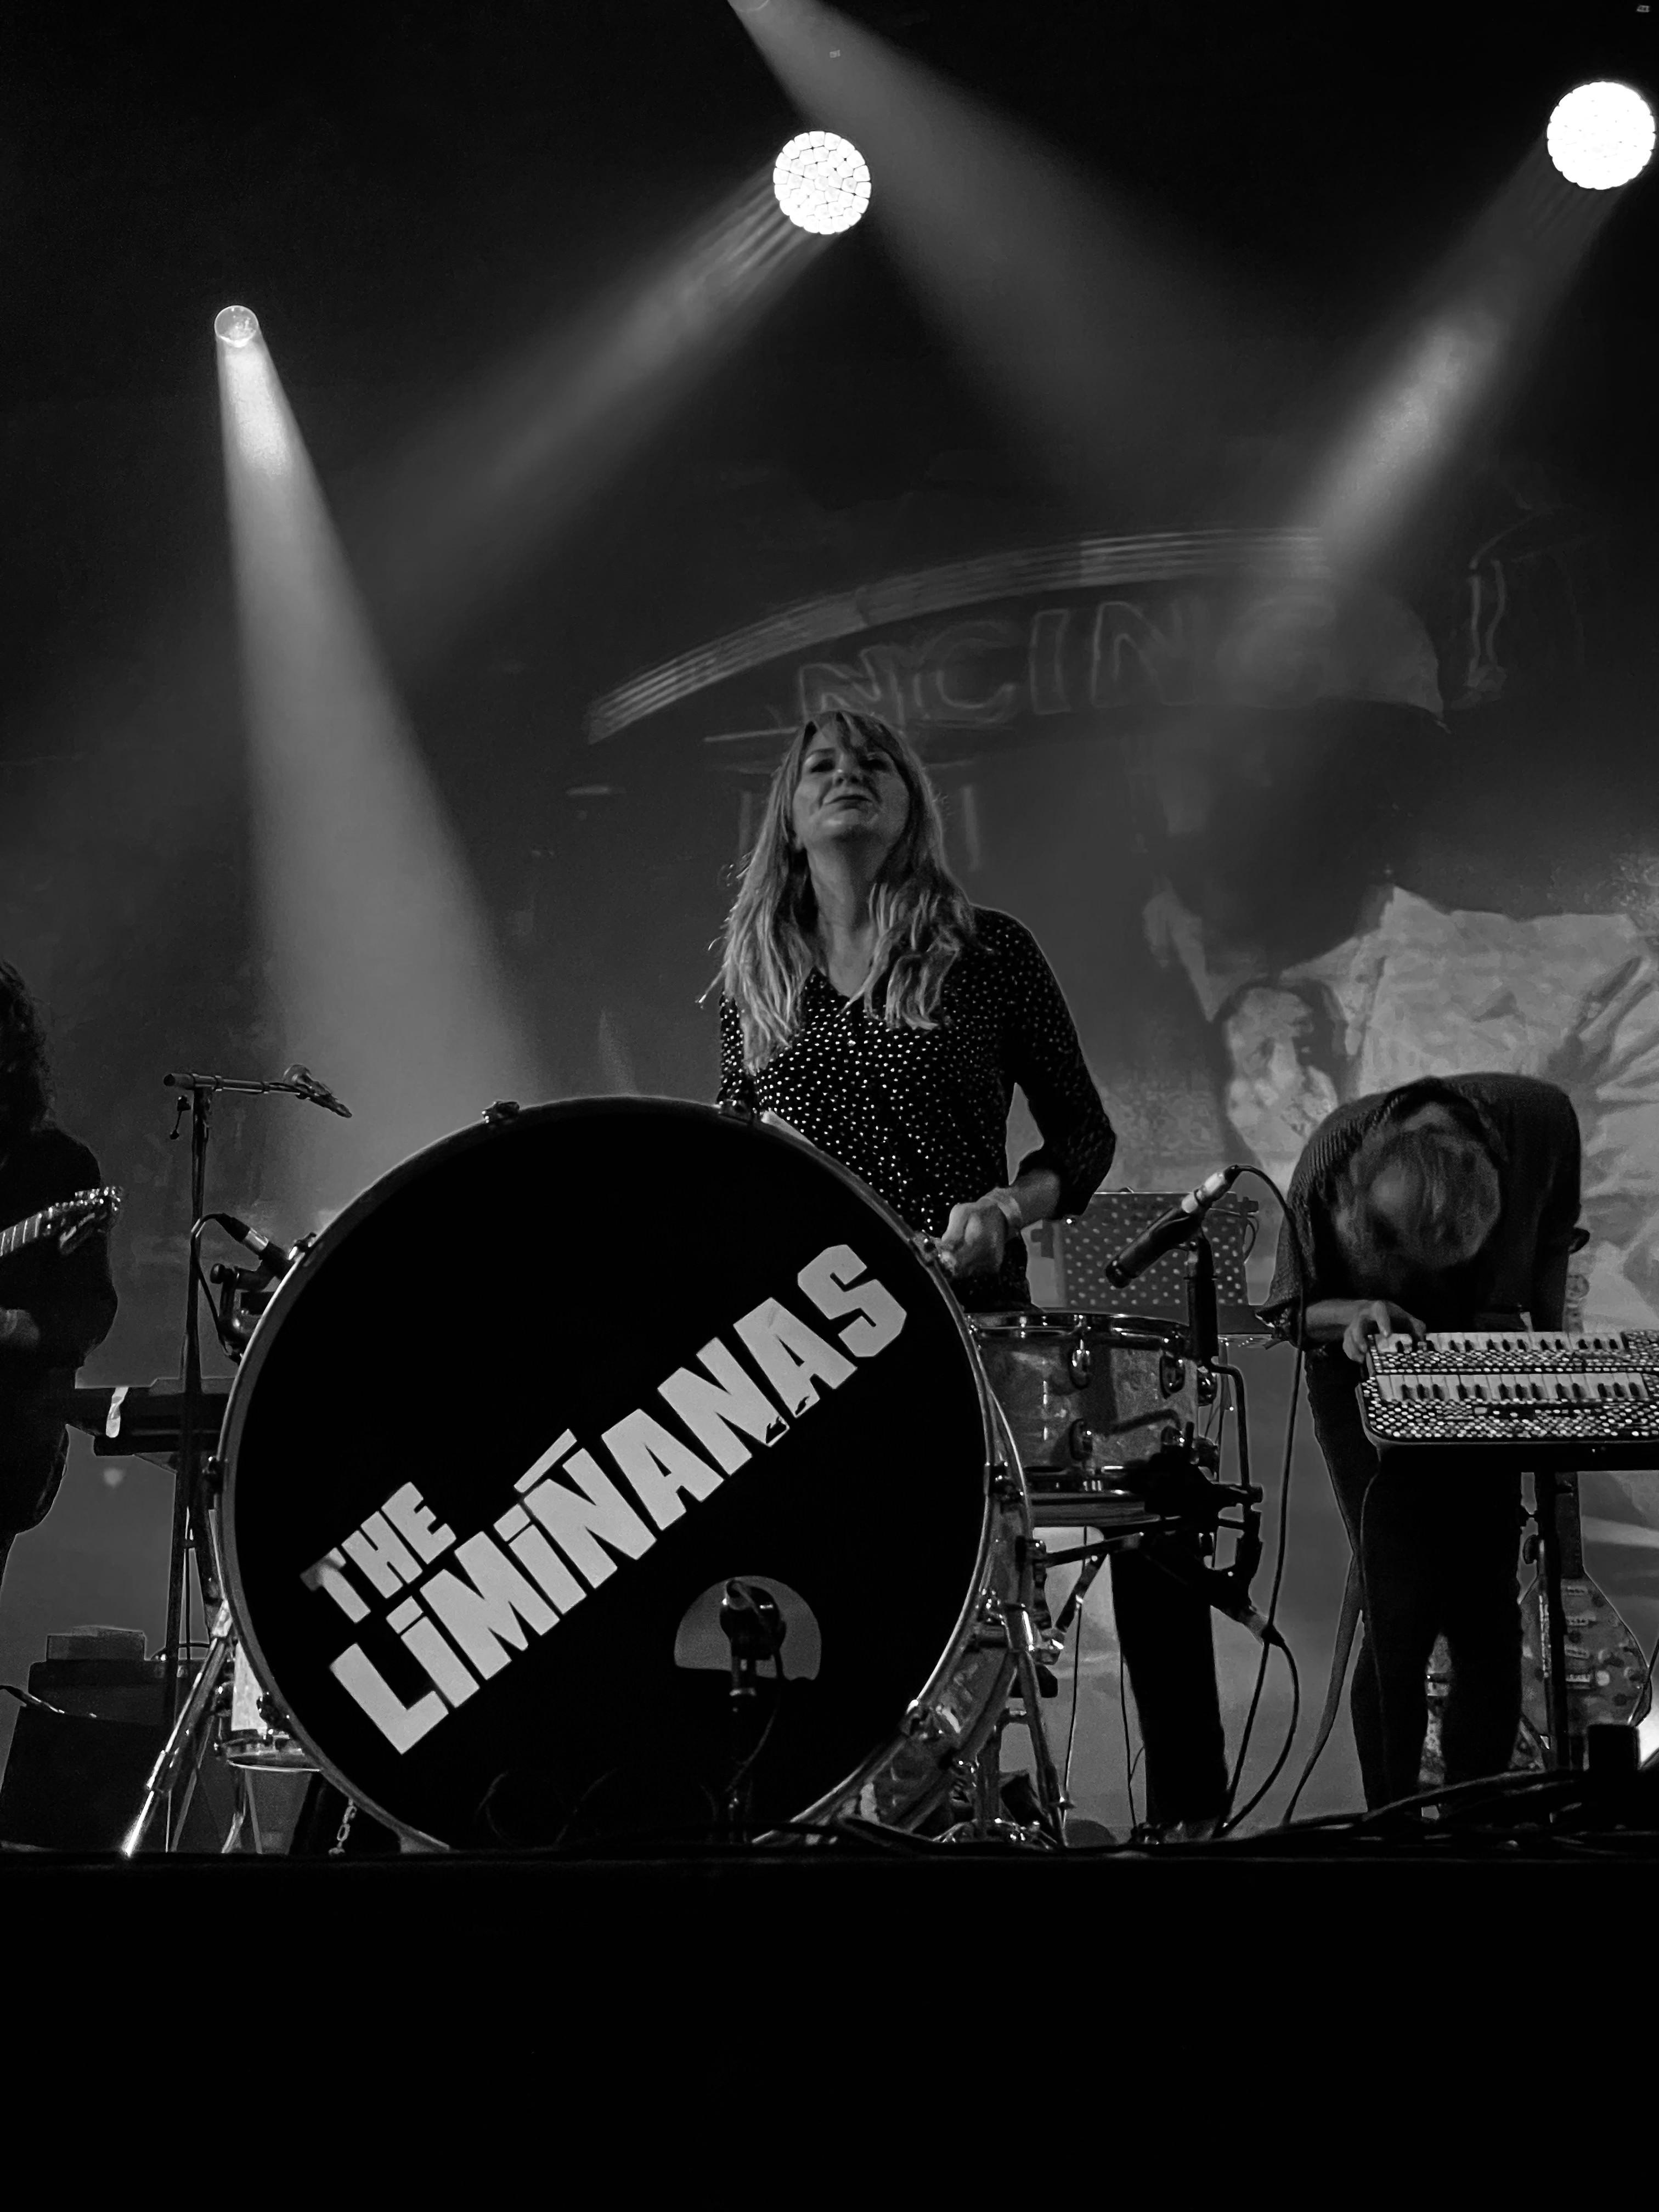 Liminanas_-_Festival_Levitation_France_24_09_2021_(2)